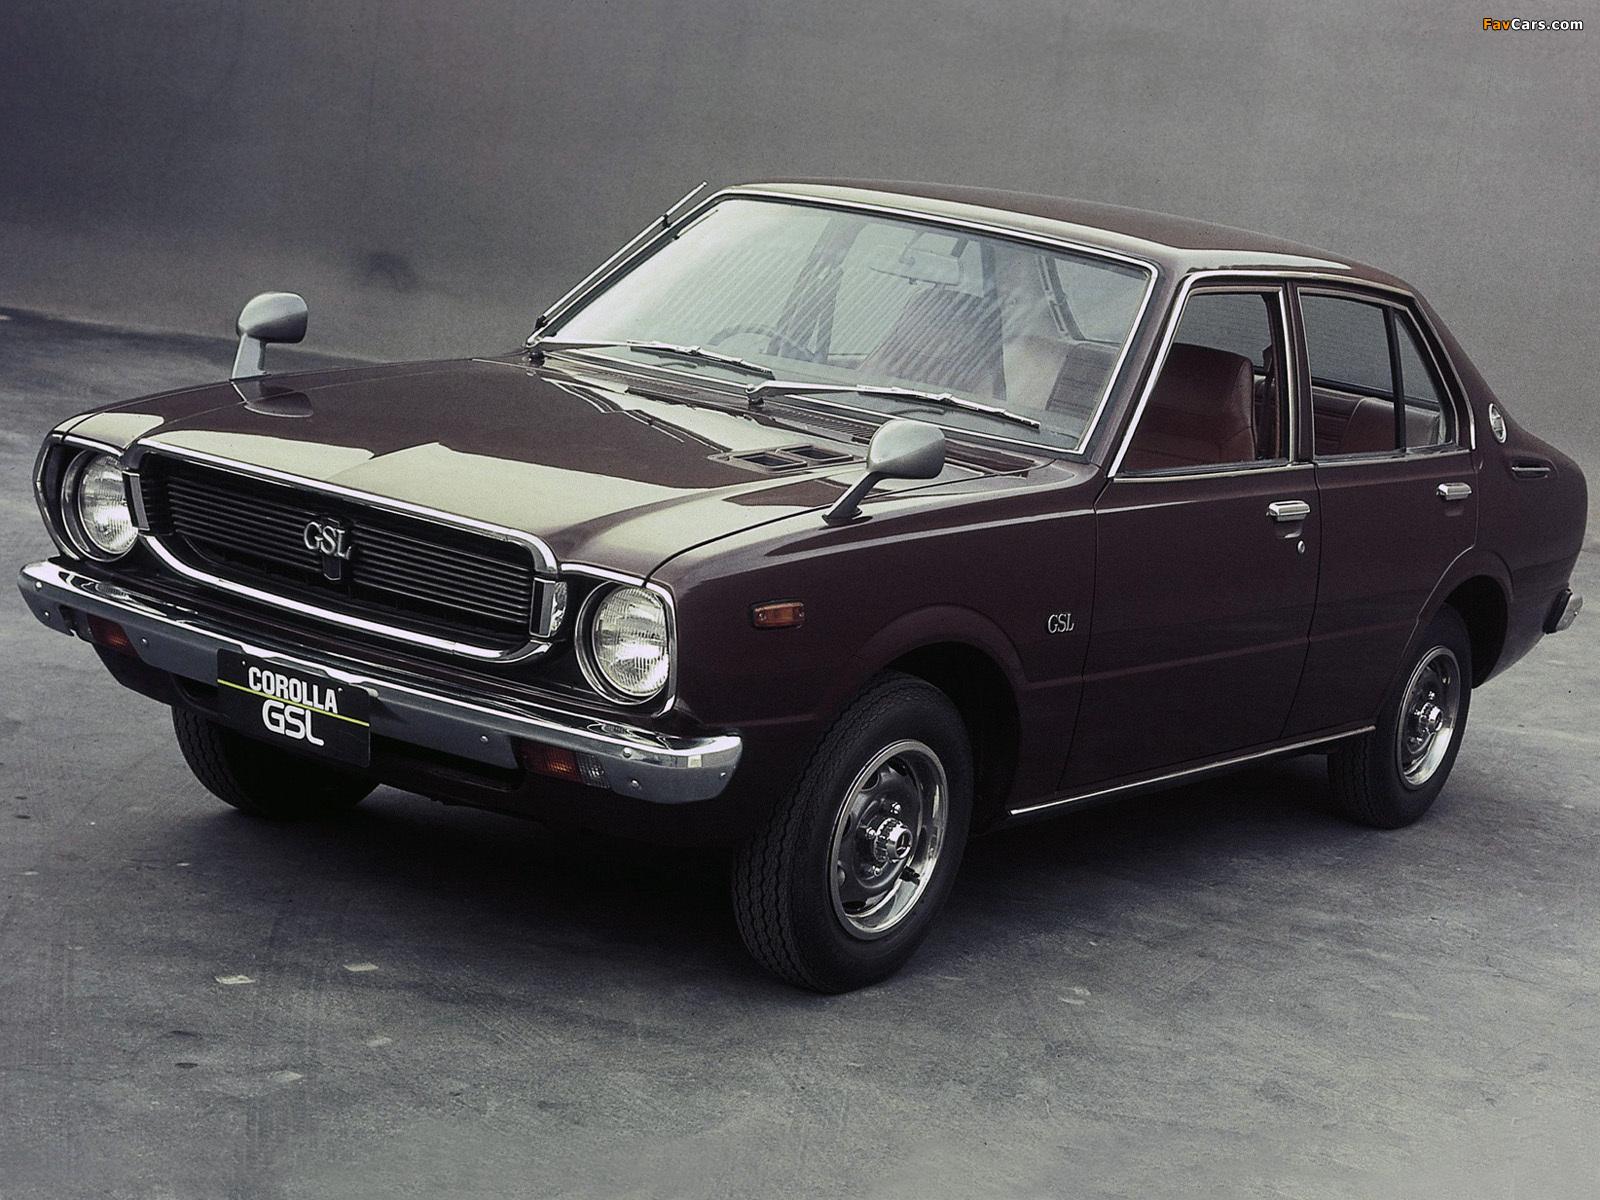 Toyota Corolla 1974 >> Toyota Corolla 4-door Sedan (E31) 1974–79 images (1600x1200)